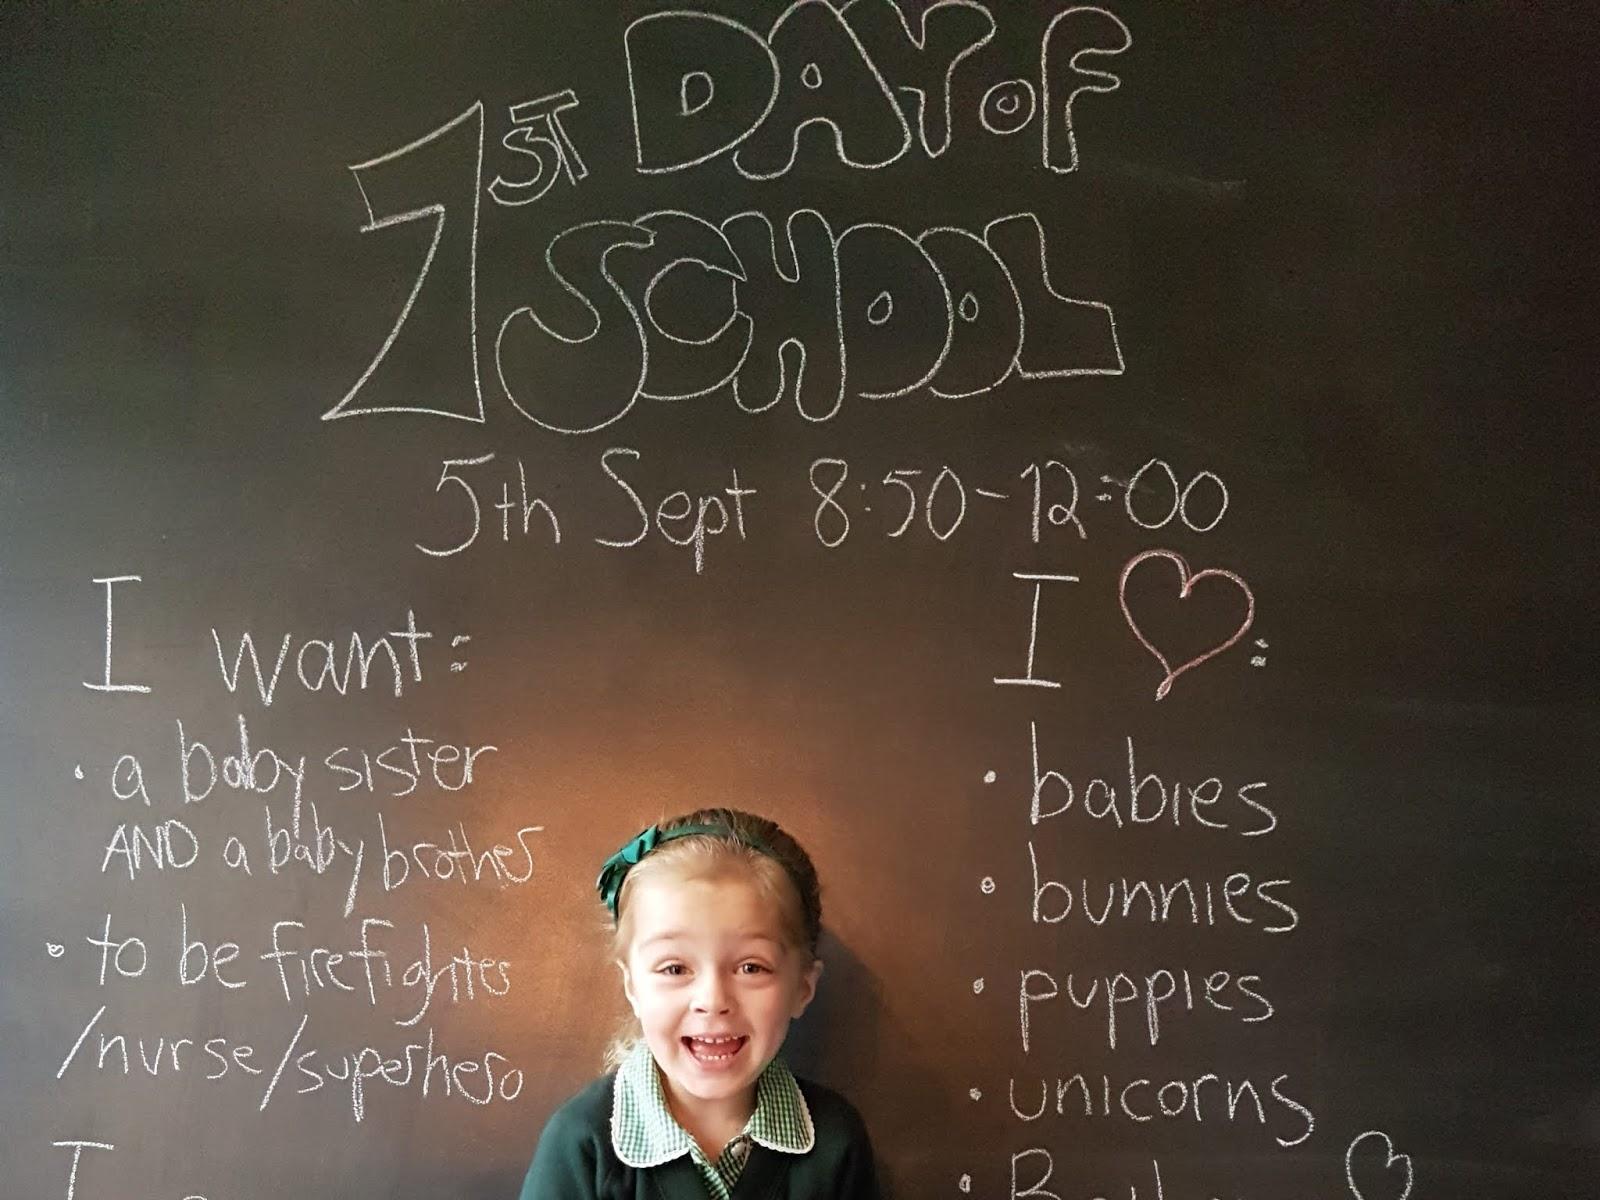 kid in front of blackboard with first day of school written on it